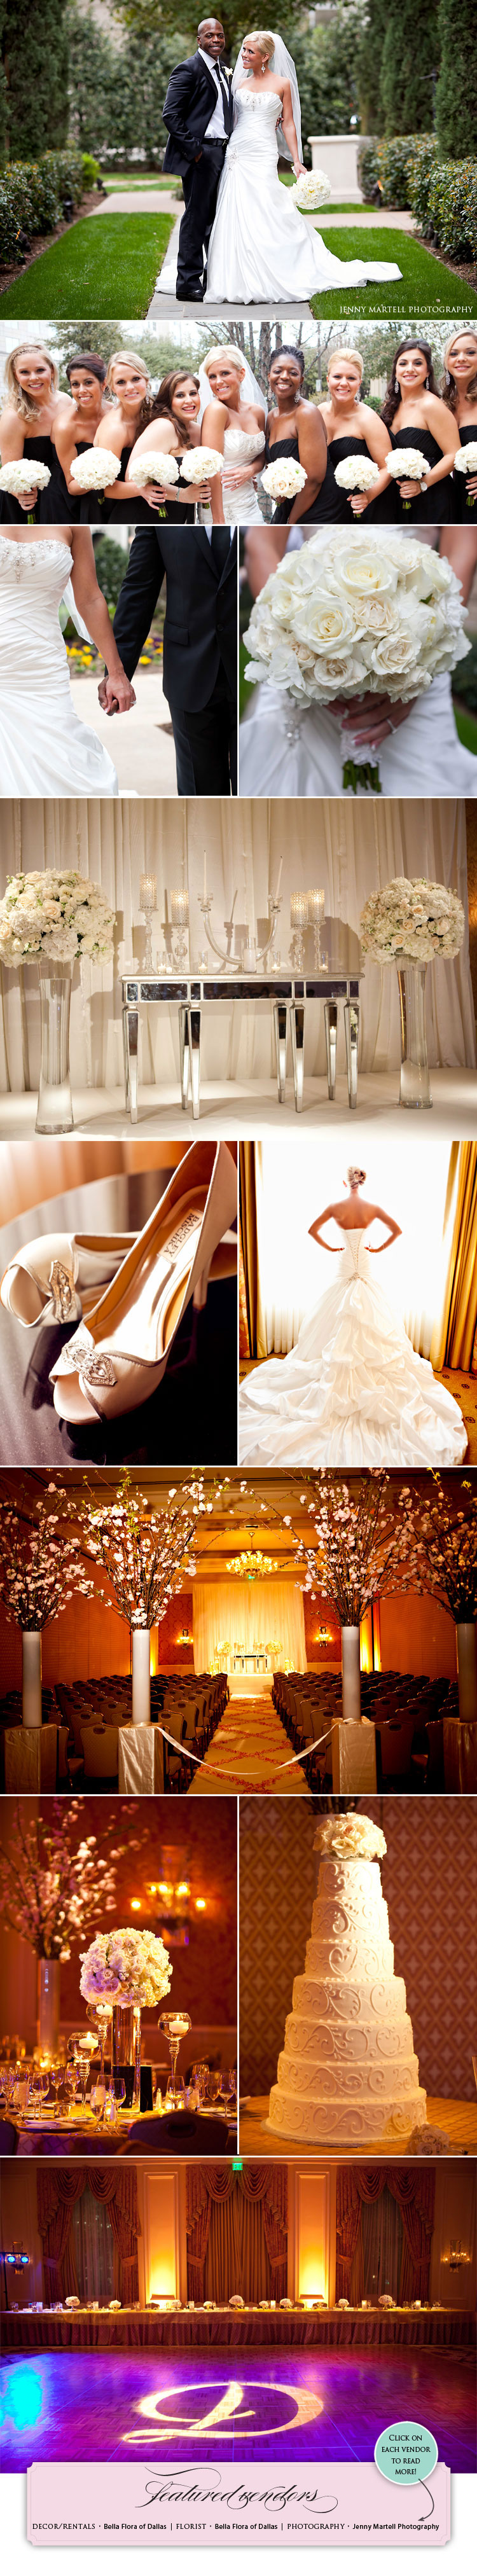 Dallas wedding photographer Jenny Martell Photography